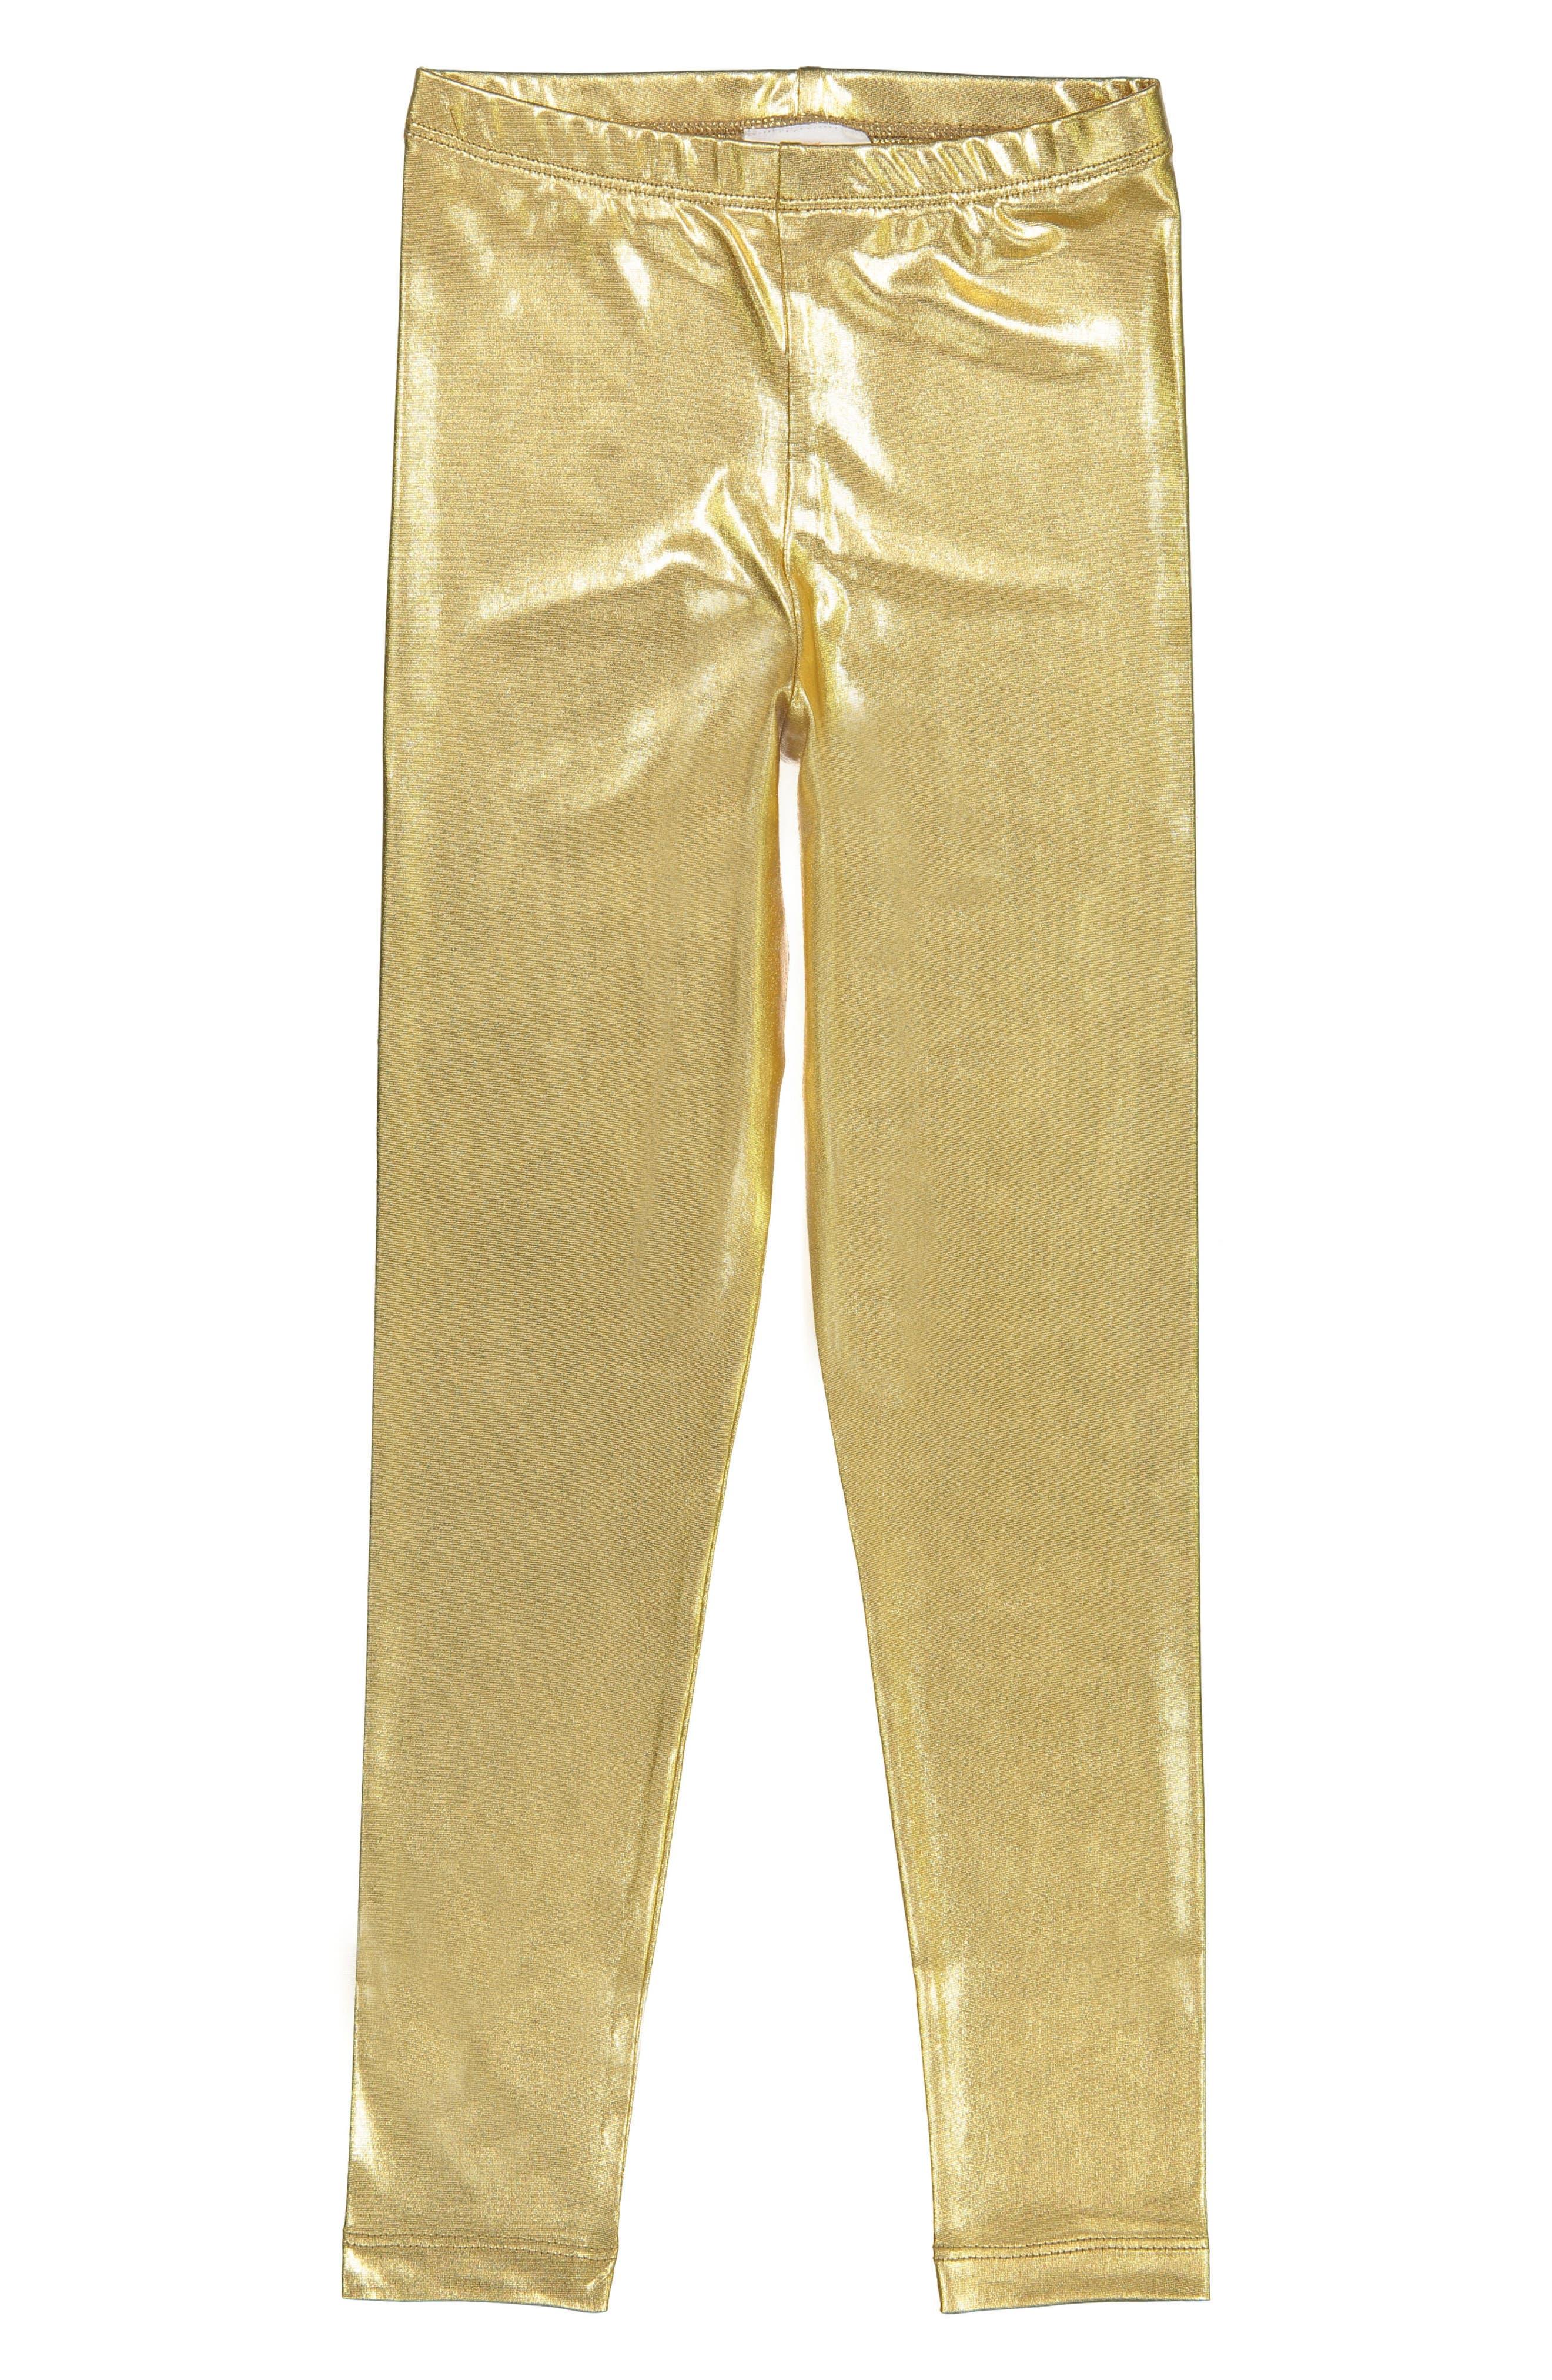 Gold Metallic Leggings,                             Main thumbnail 1, color,                             Gold